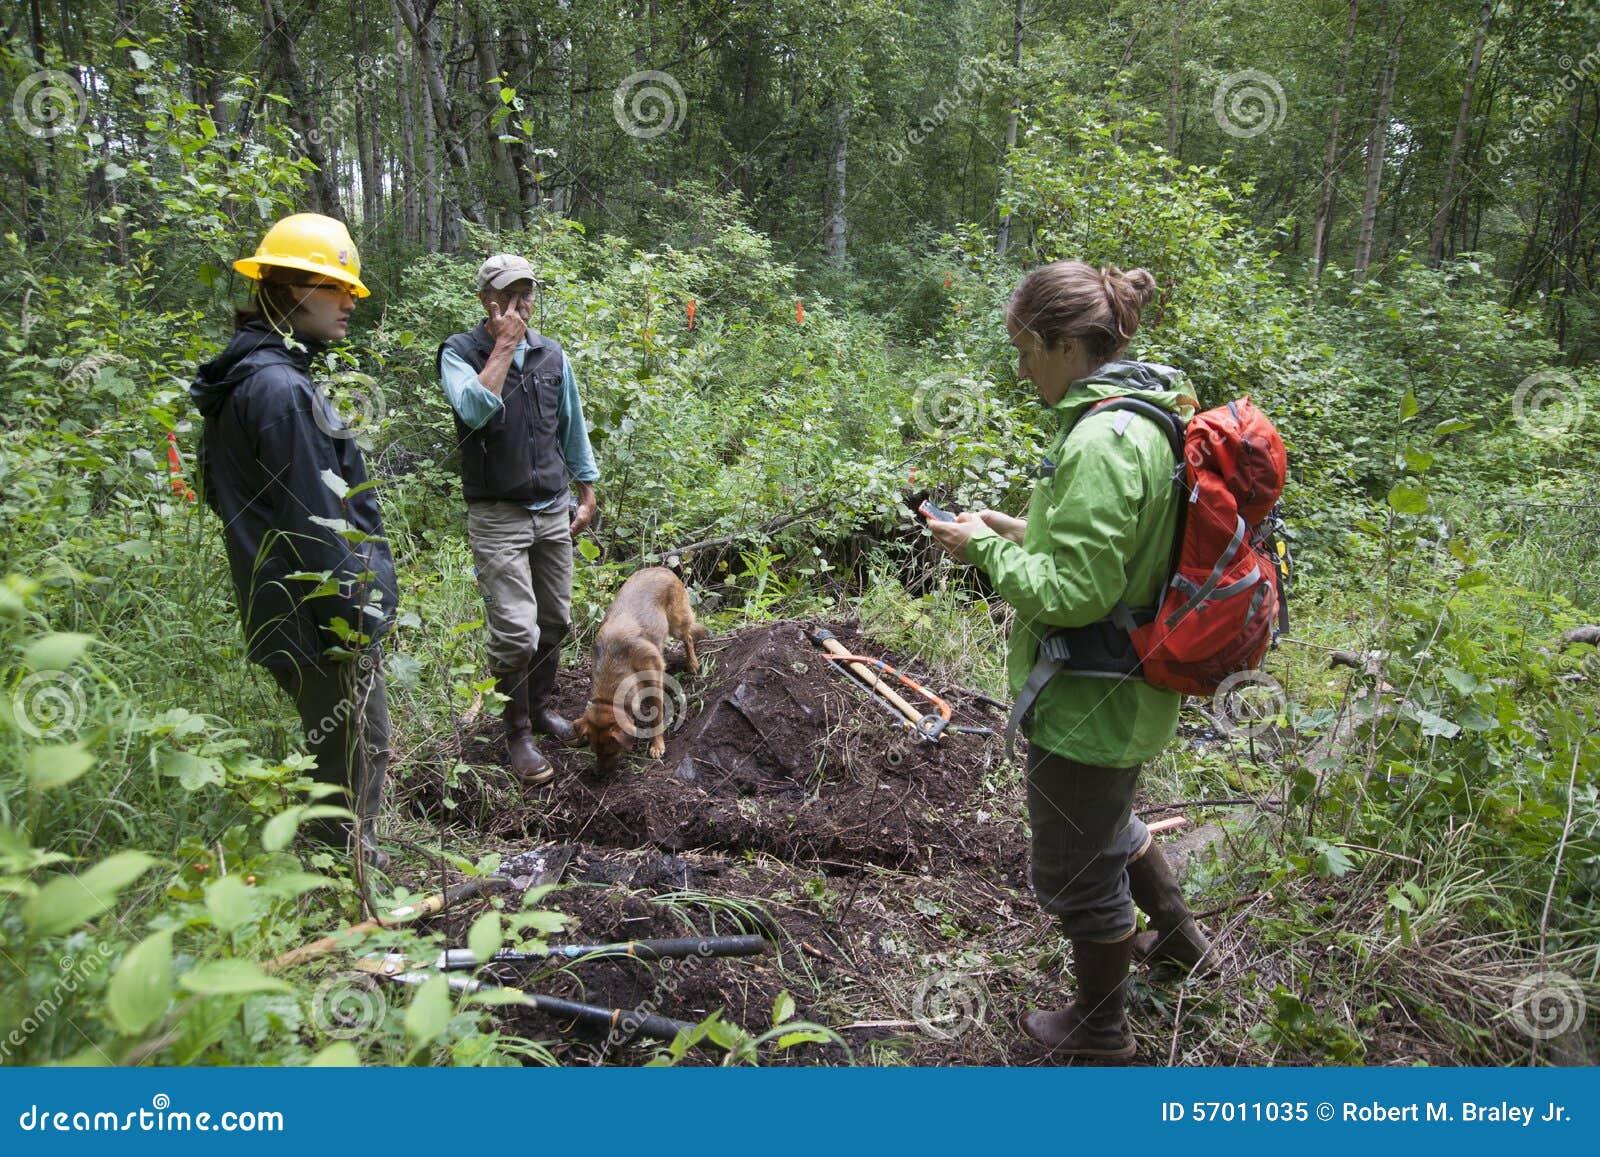 Alaska Wilderness Trail Construction